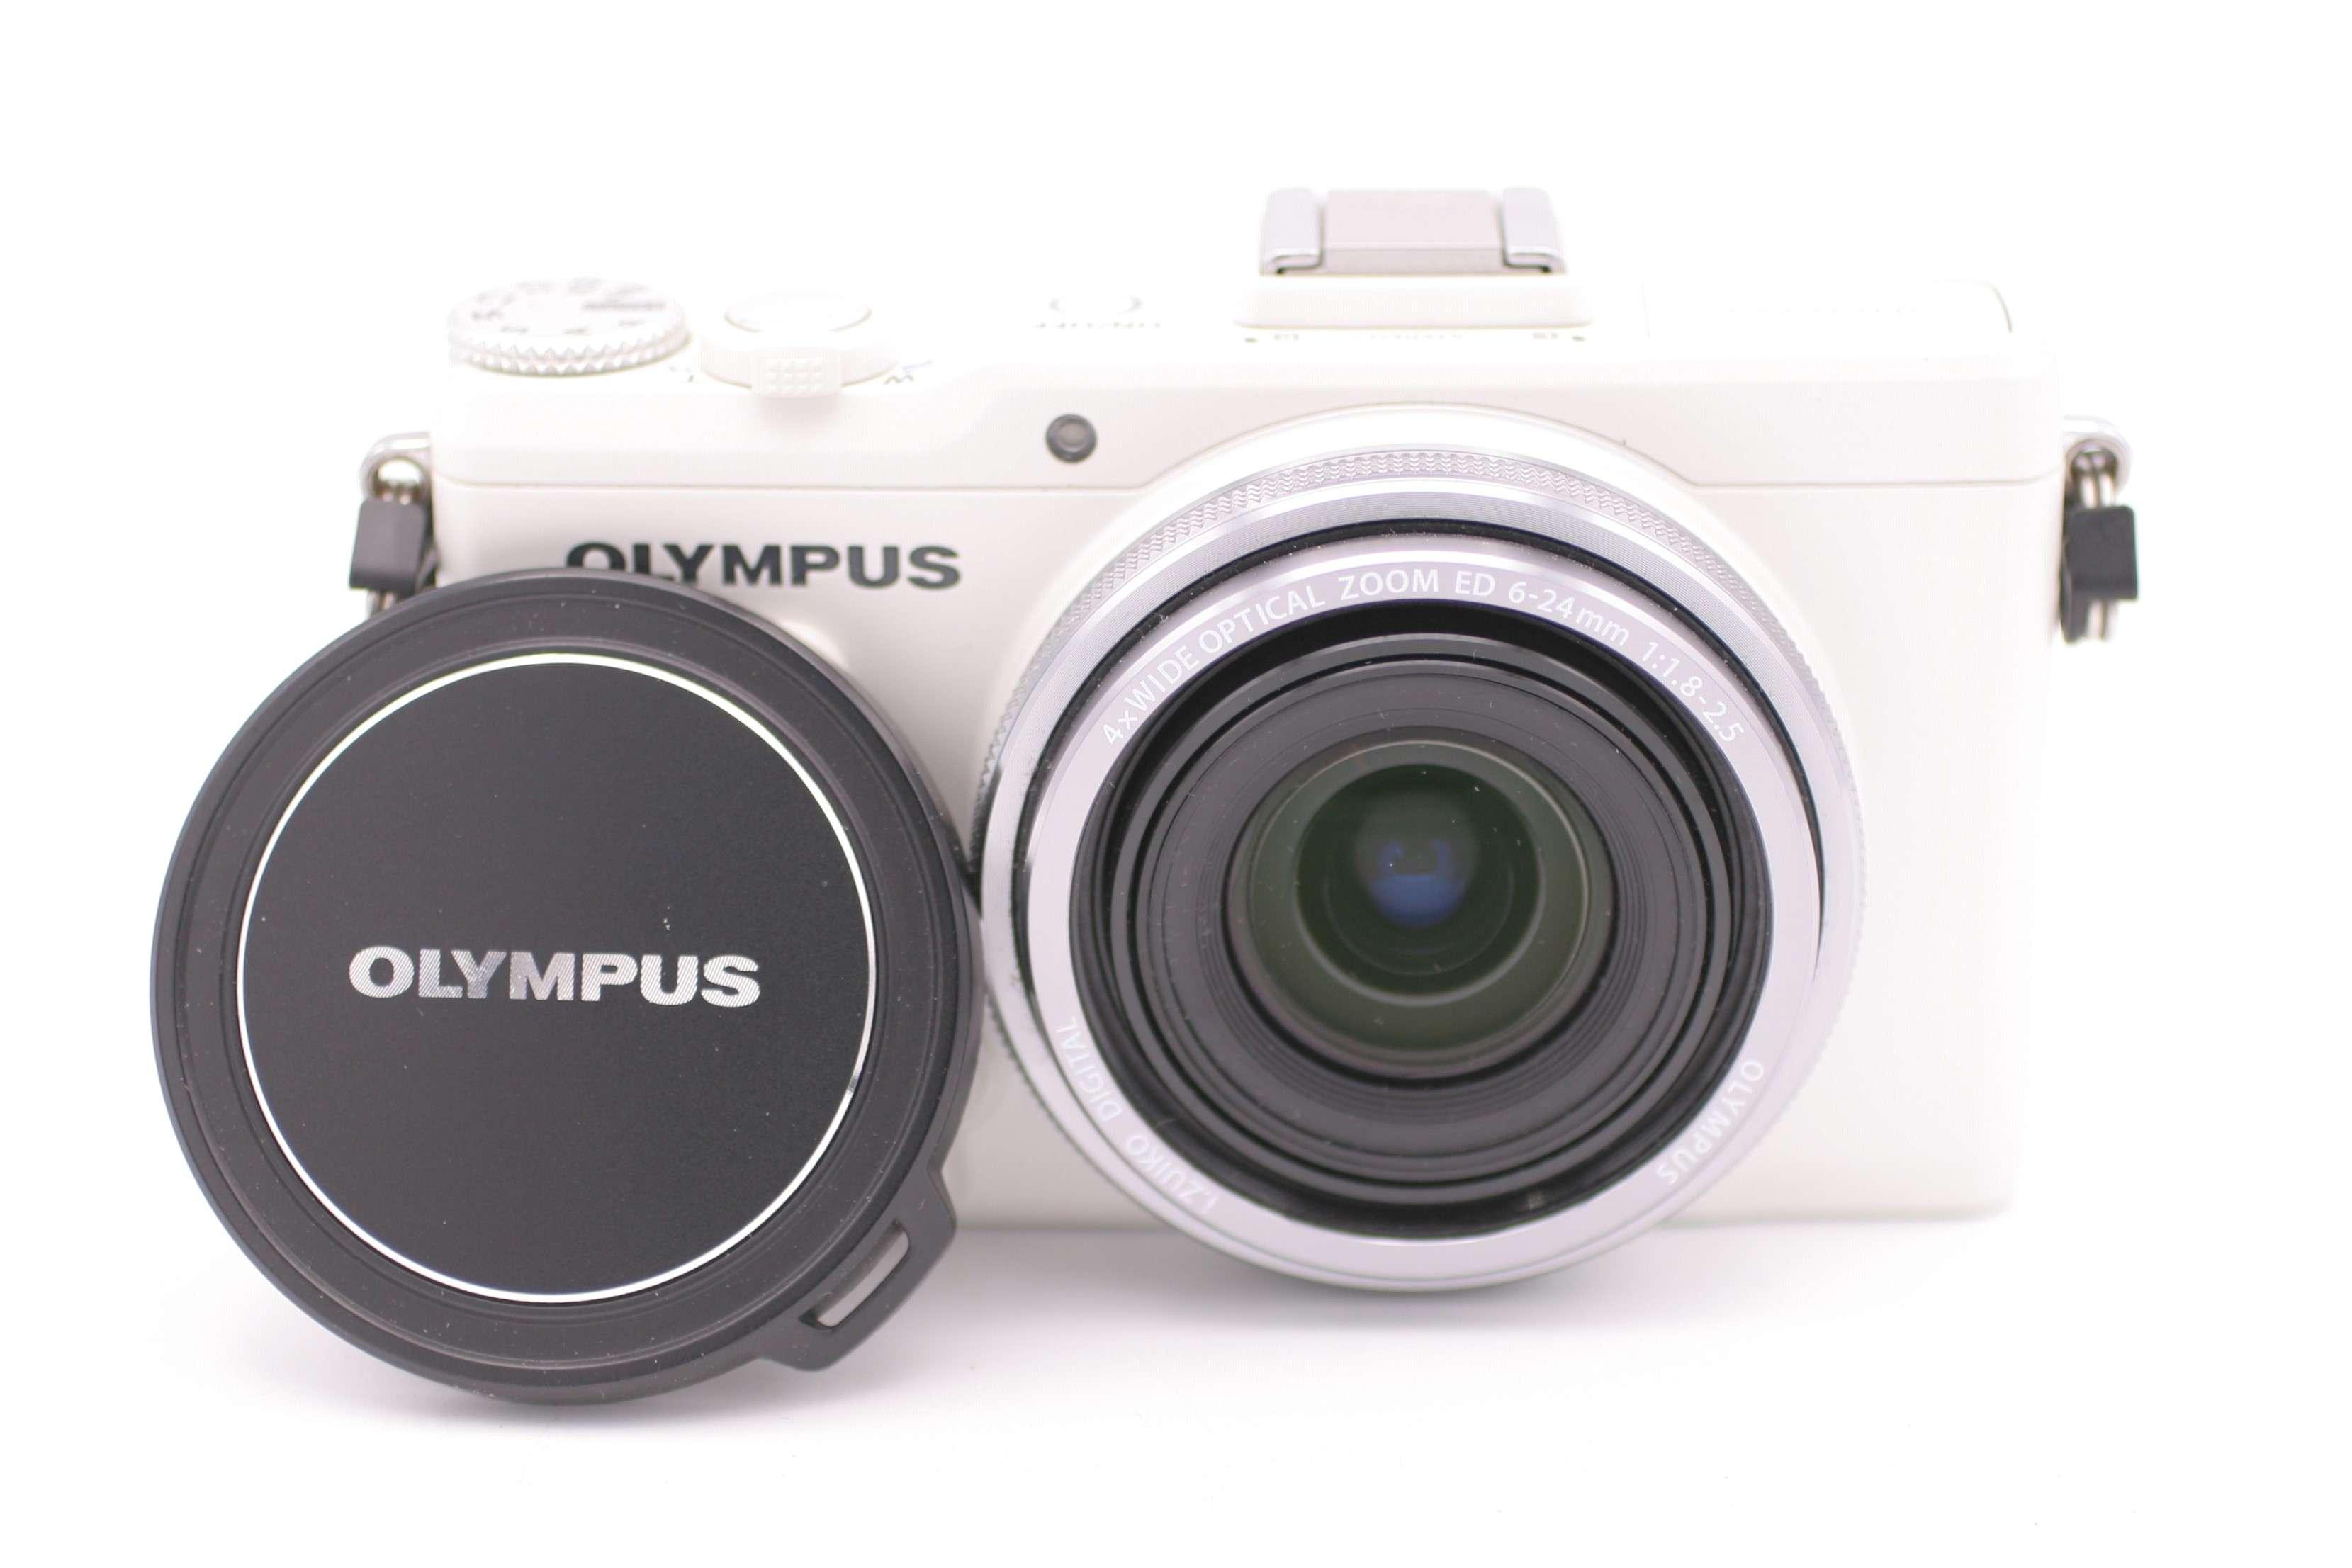 Olympus Xz 2 Manual Mzuiko Digital Ed 14 150mm F40 56 10 Review Array Stylus 12 0mp Camera White Ebay Rh Com